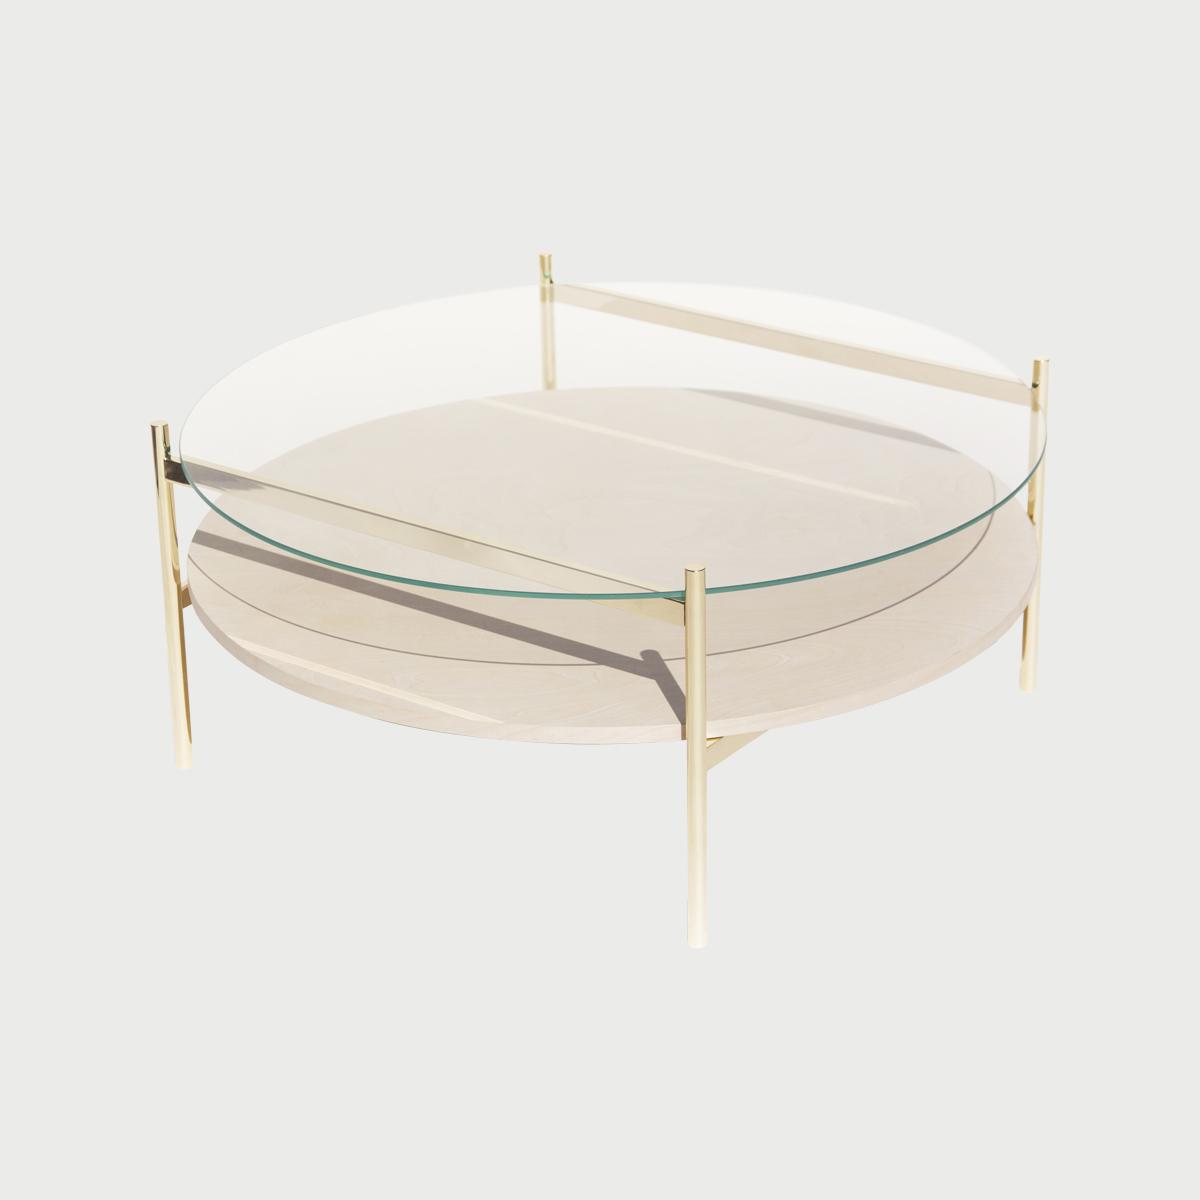 Duotone Circular Coffee Table - Brass / Clear / Birch